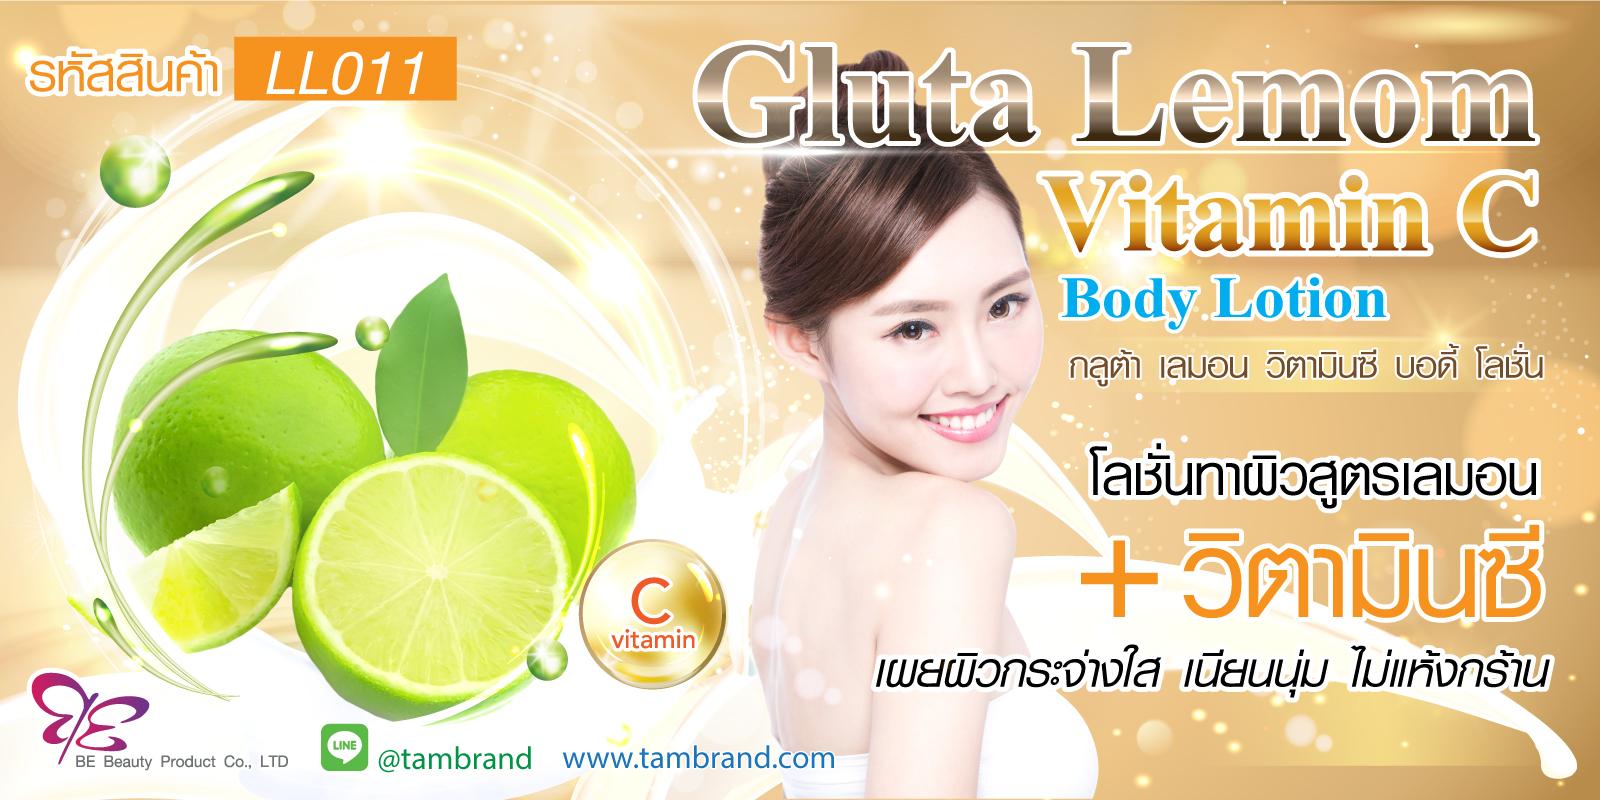 Gluta Lemom Vitamin C Body Lotion กลูต้า เลมอน วิตามินซี บอดี้ โลชั่น : สำหรับทำแบรนด์และแบ่งบรรจุ